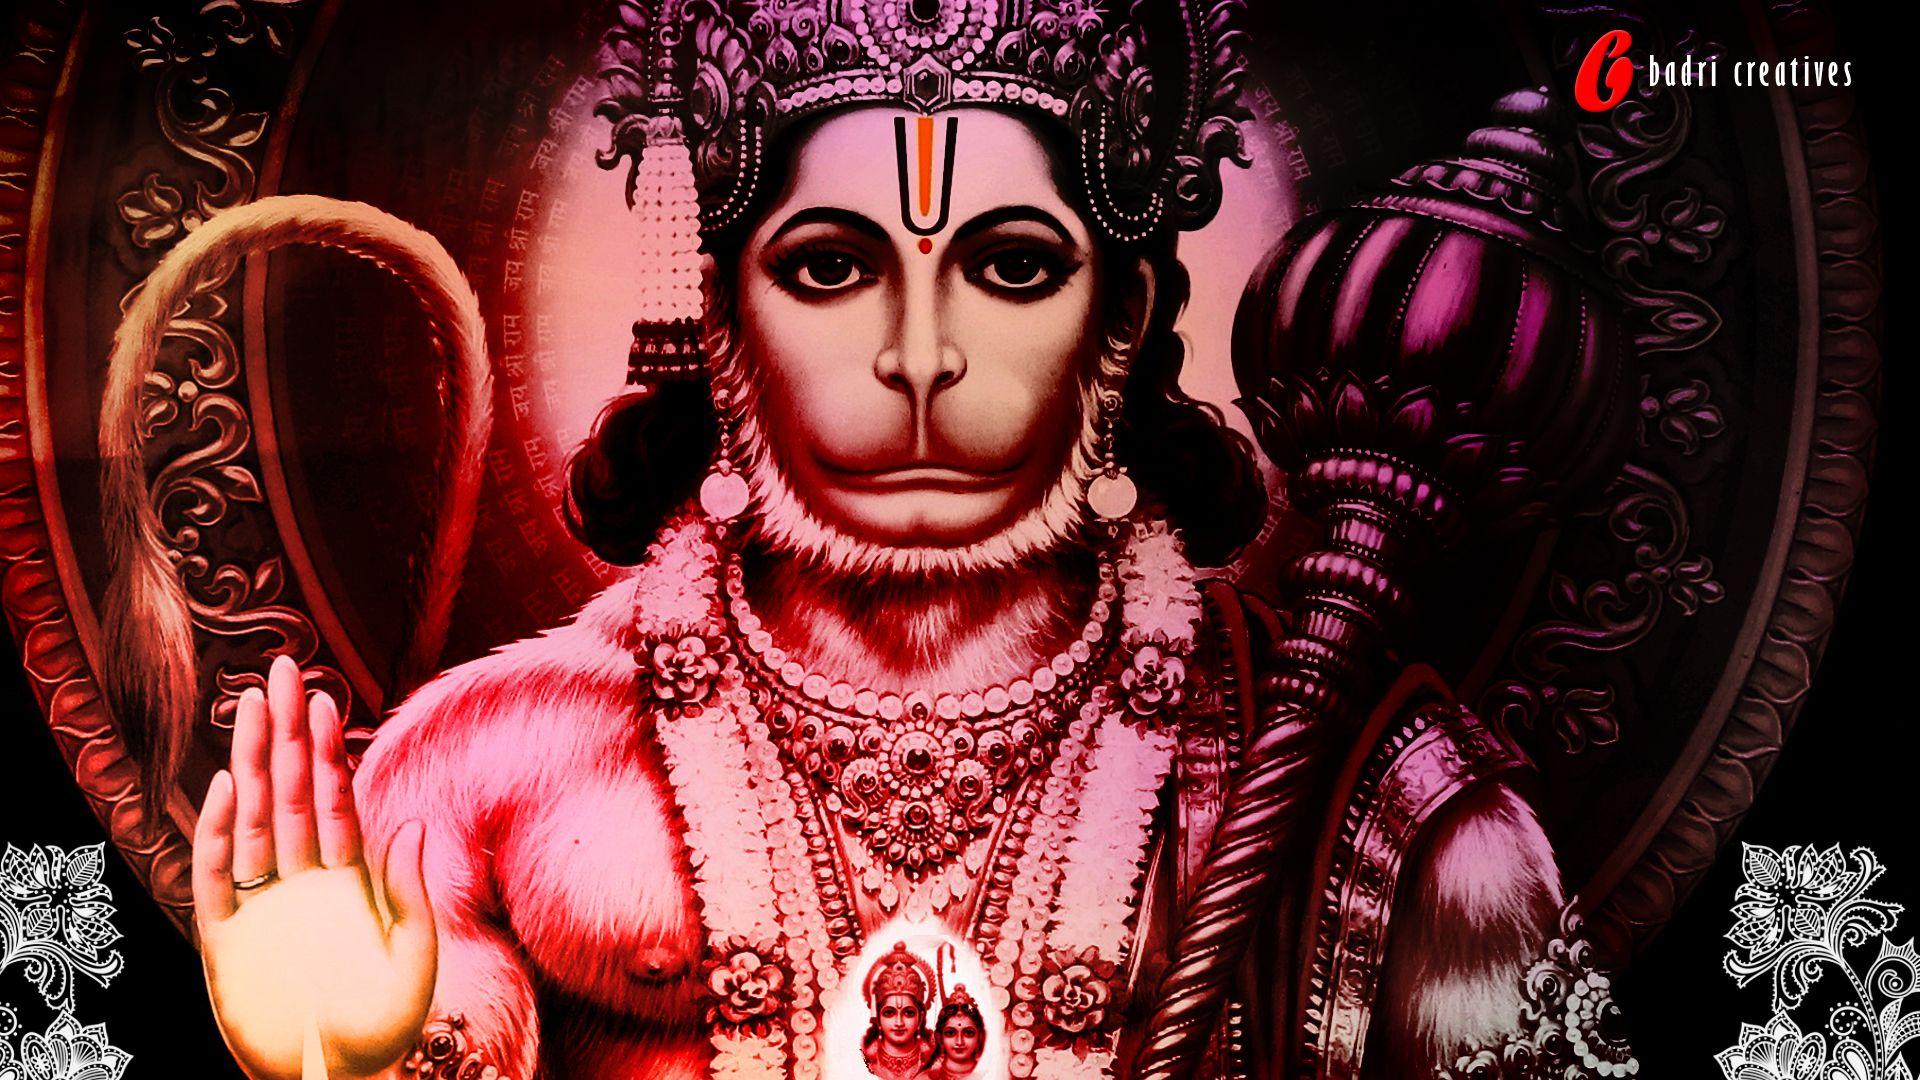 Hd wallpaper of hanuman - Lord Hanuman Hq Wallpaper